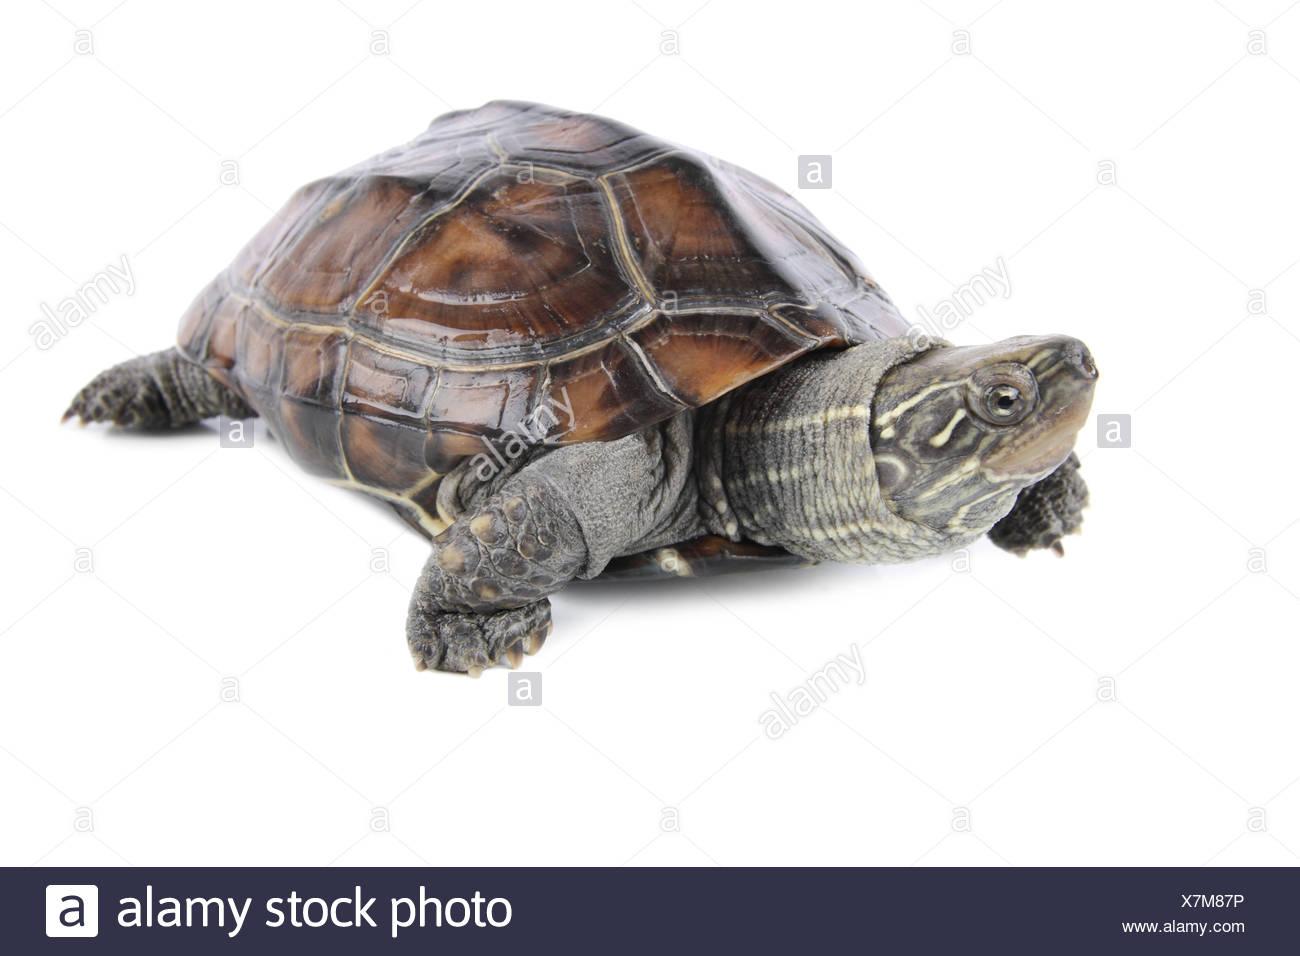 tropical tortoise Stock Photo